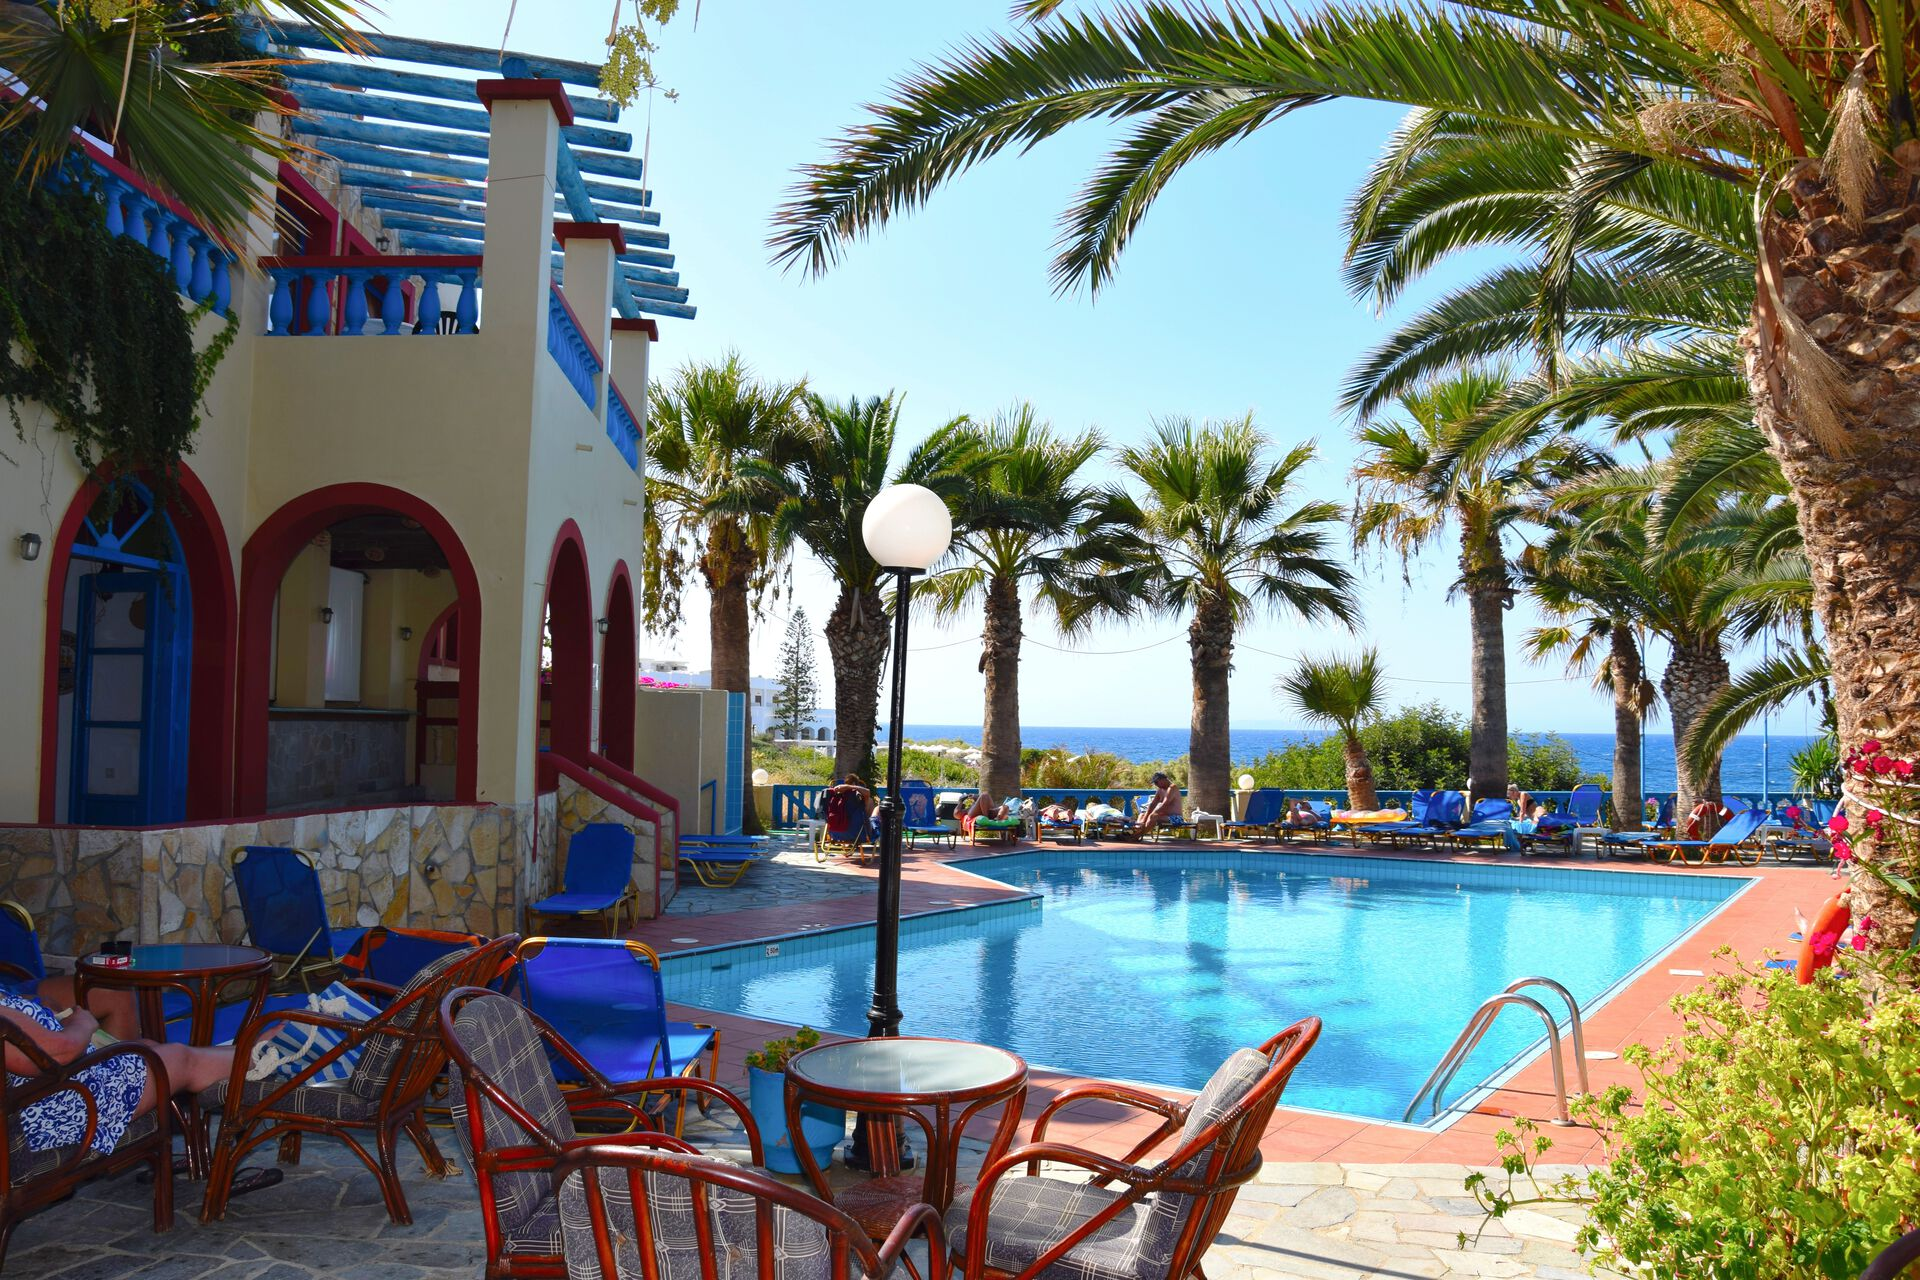 Séjour Grèce - Hotel Palm Bay - 2*